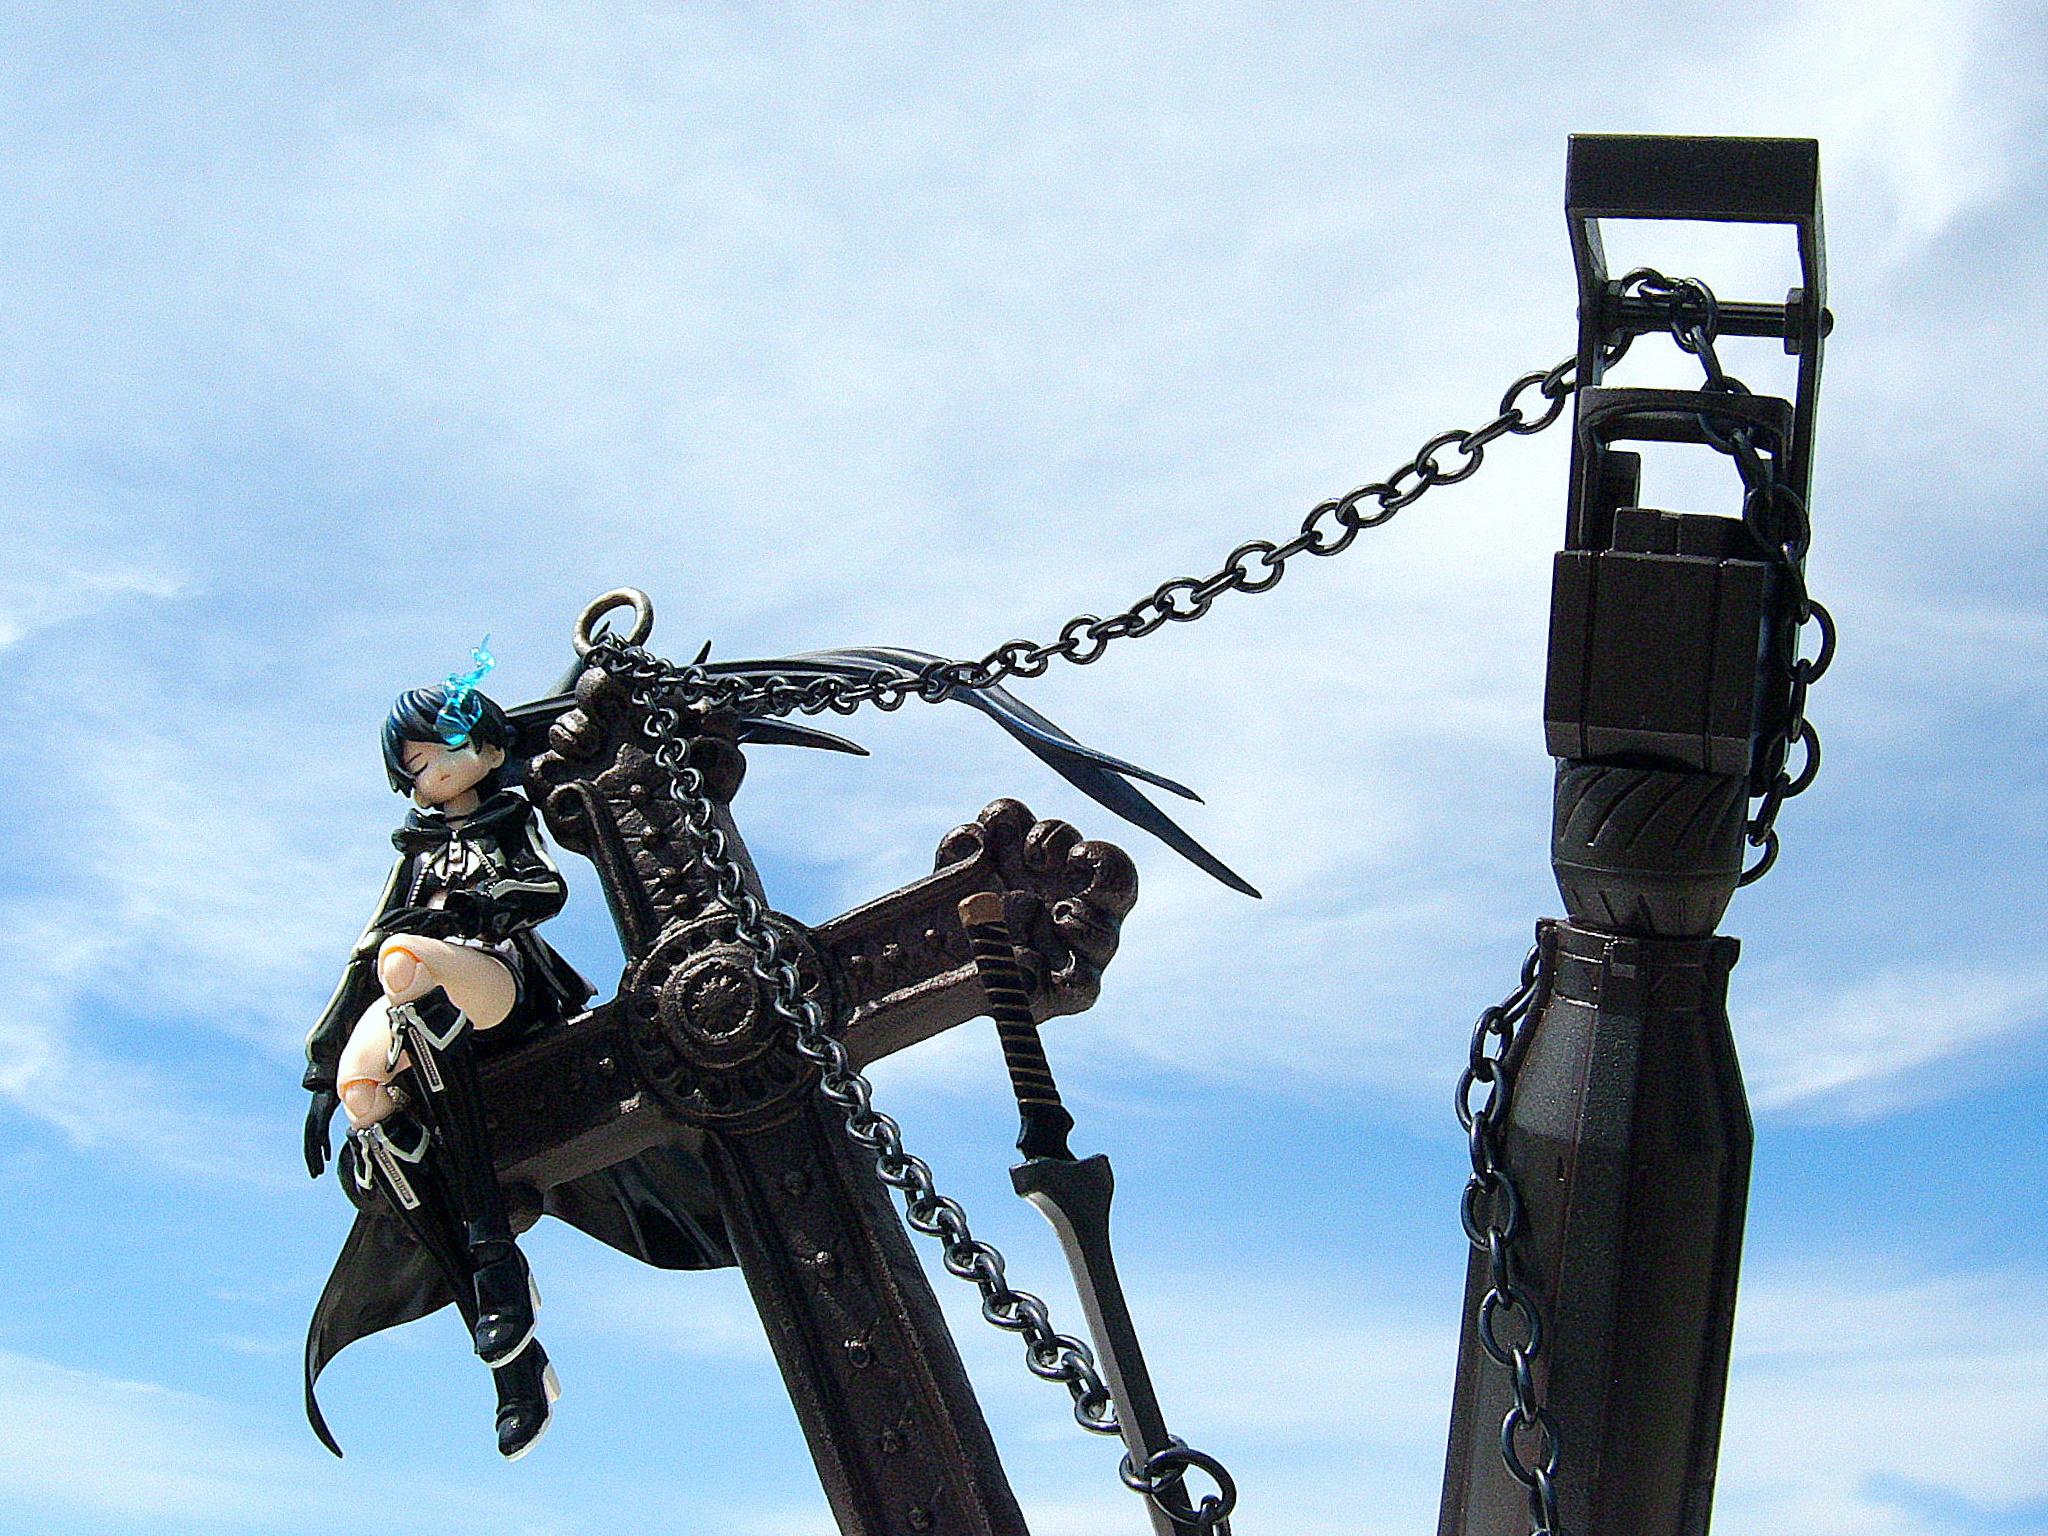 figma cross chains black_clothes black_hair sky black_★_rock_shooter